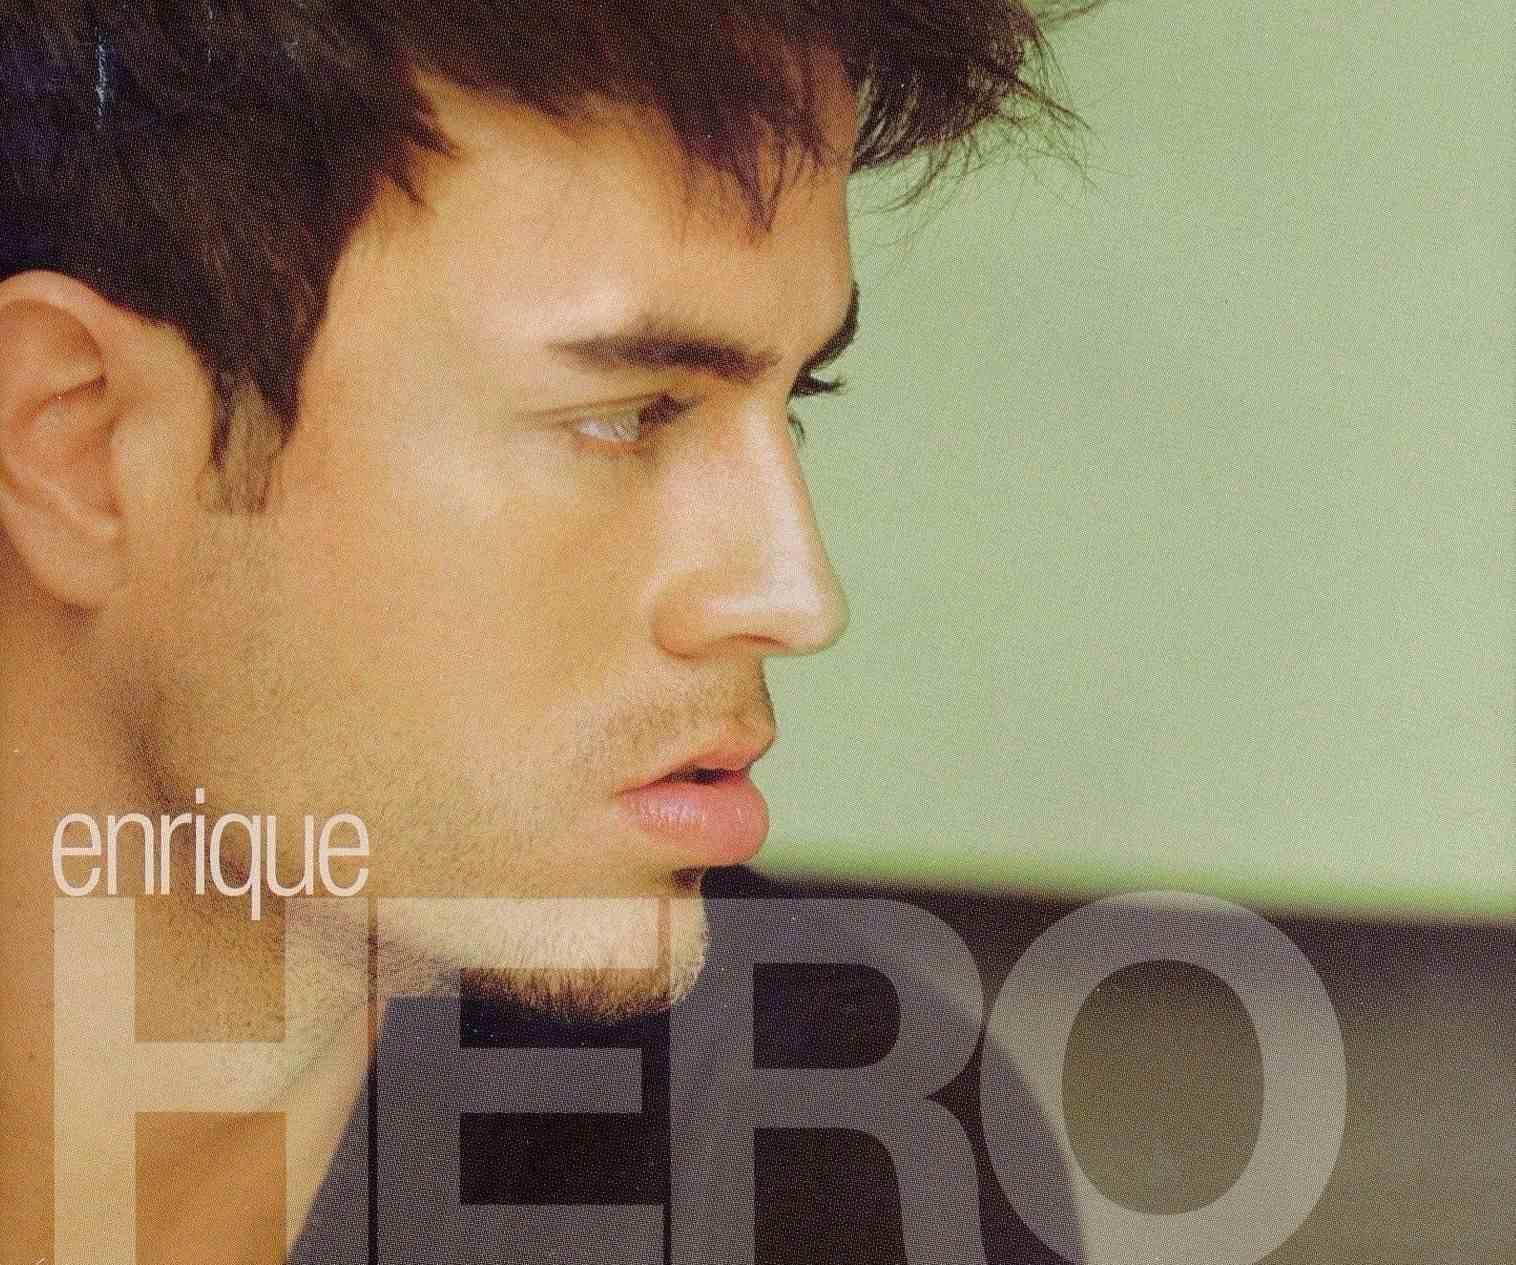 10 Best Enrique Iglesias Songs